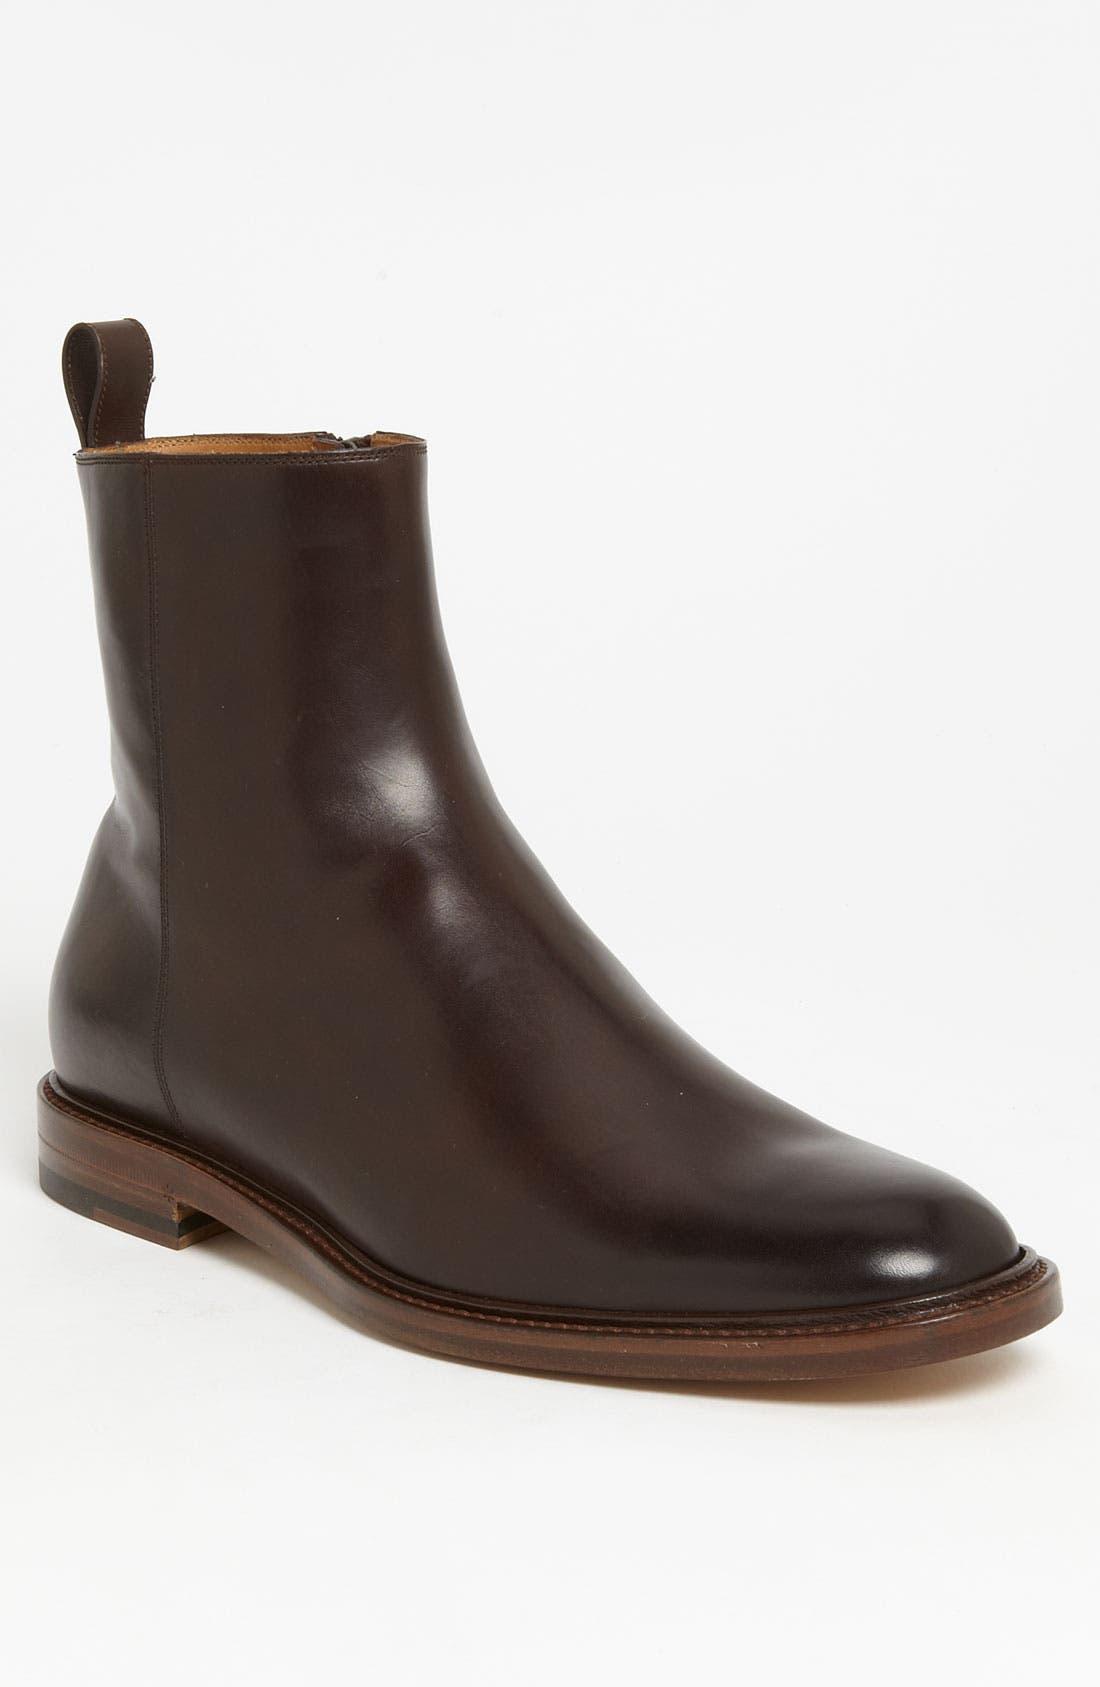 Main Image - Gucci 'Cezanne' Plain Toe Boot